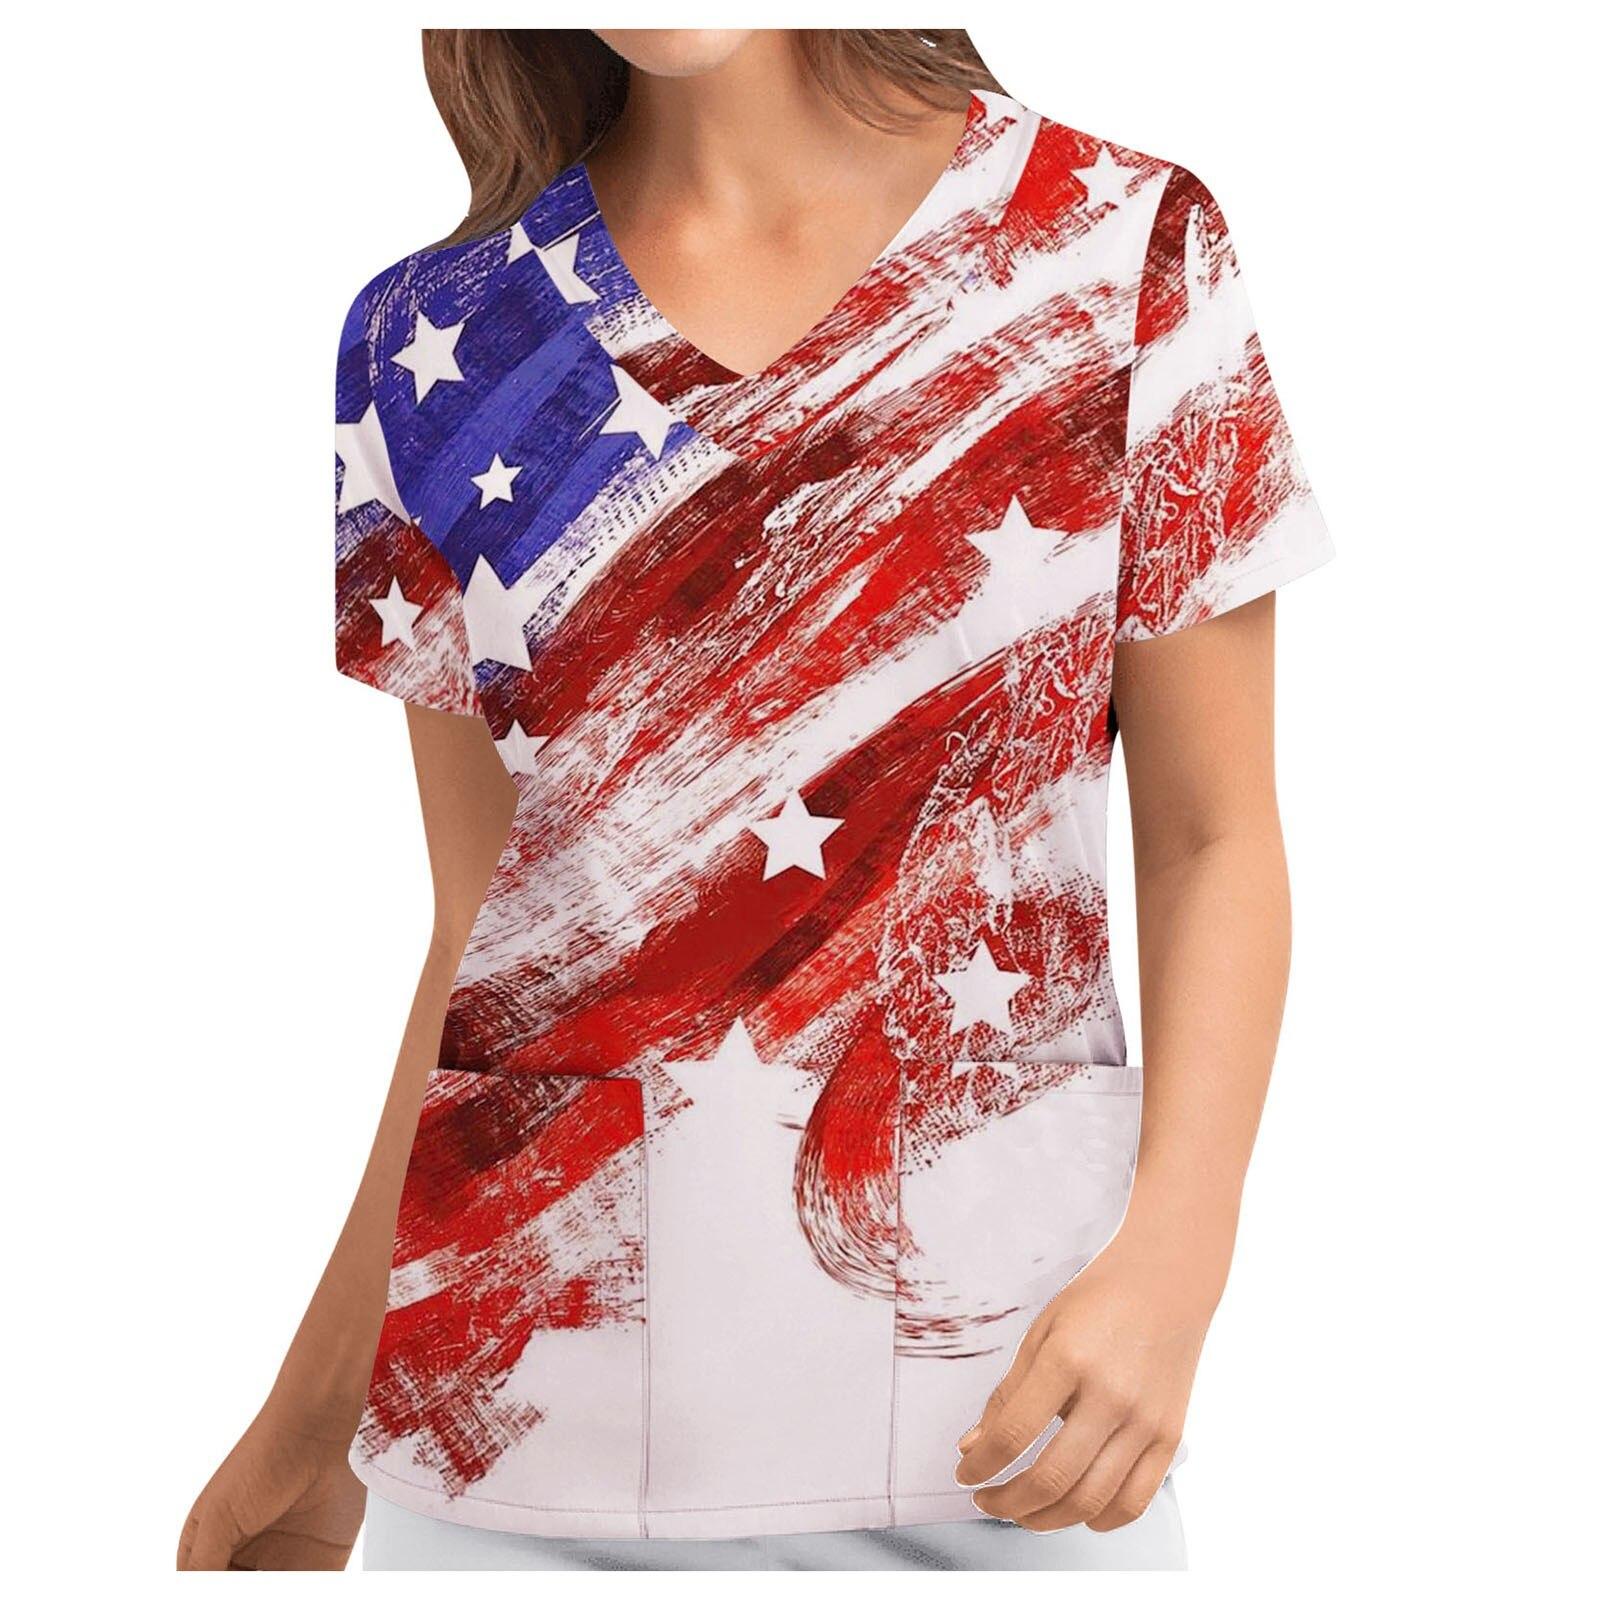 Hospital Carer Nurse Uniform Women Independence Day Flag Print Working Scrub Top With Pockets For Beauty Salon Gorro Enfermera